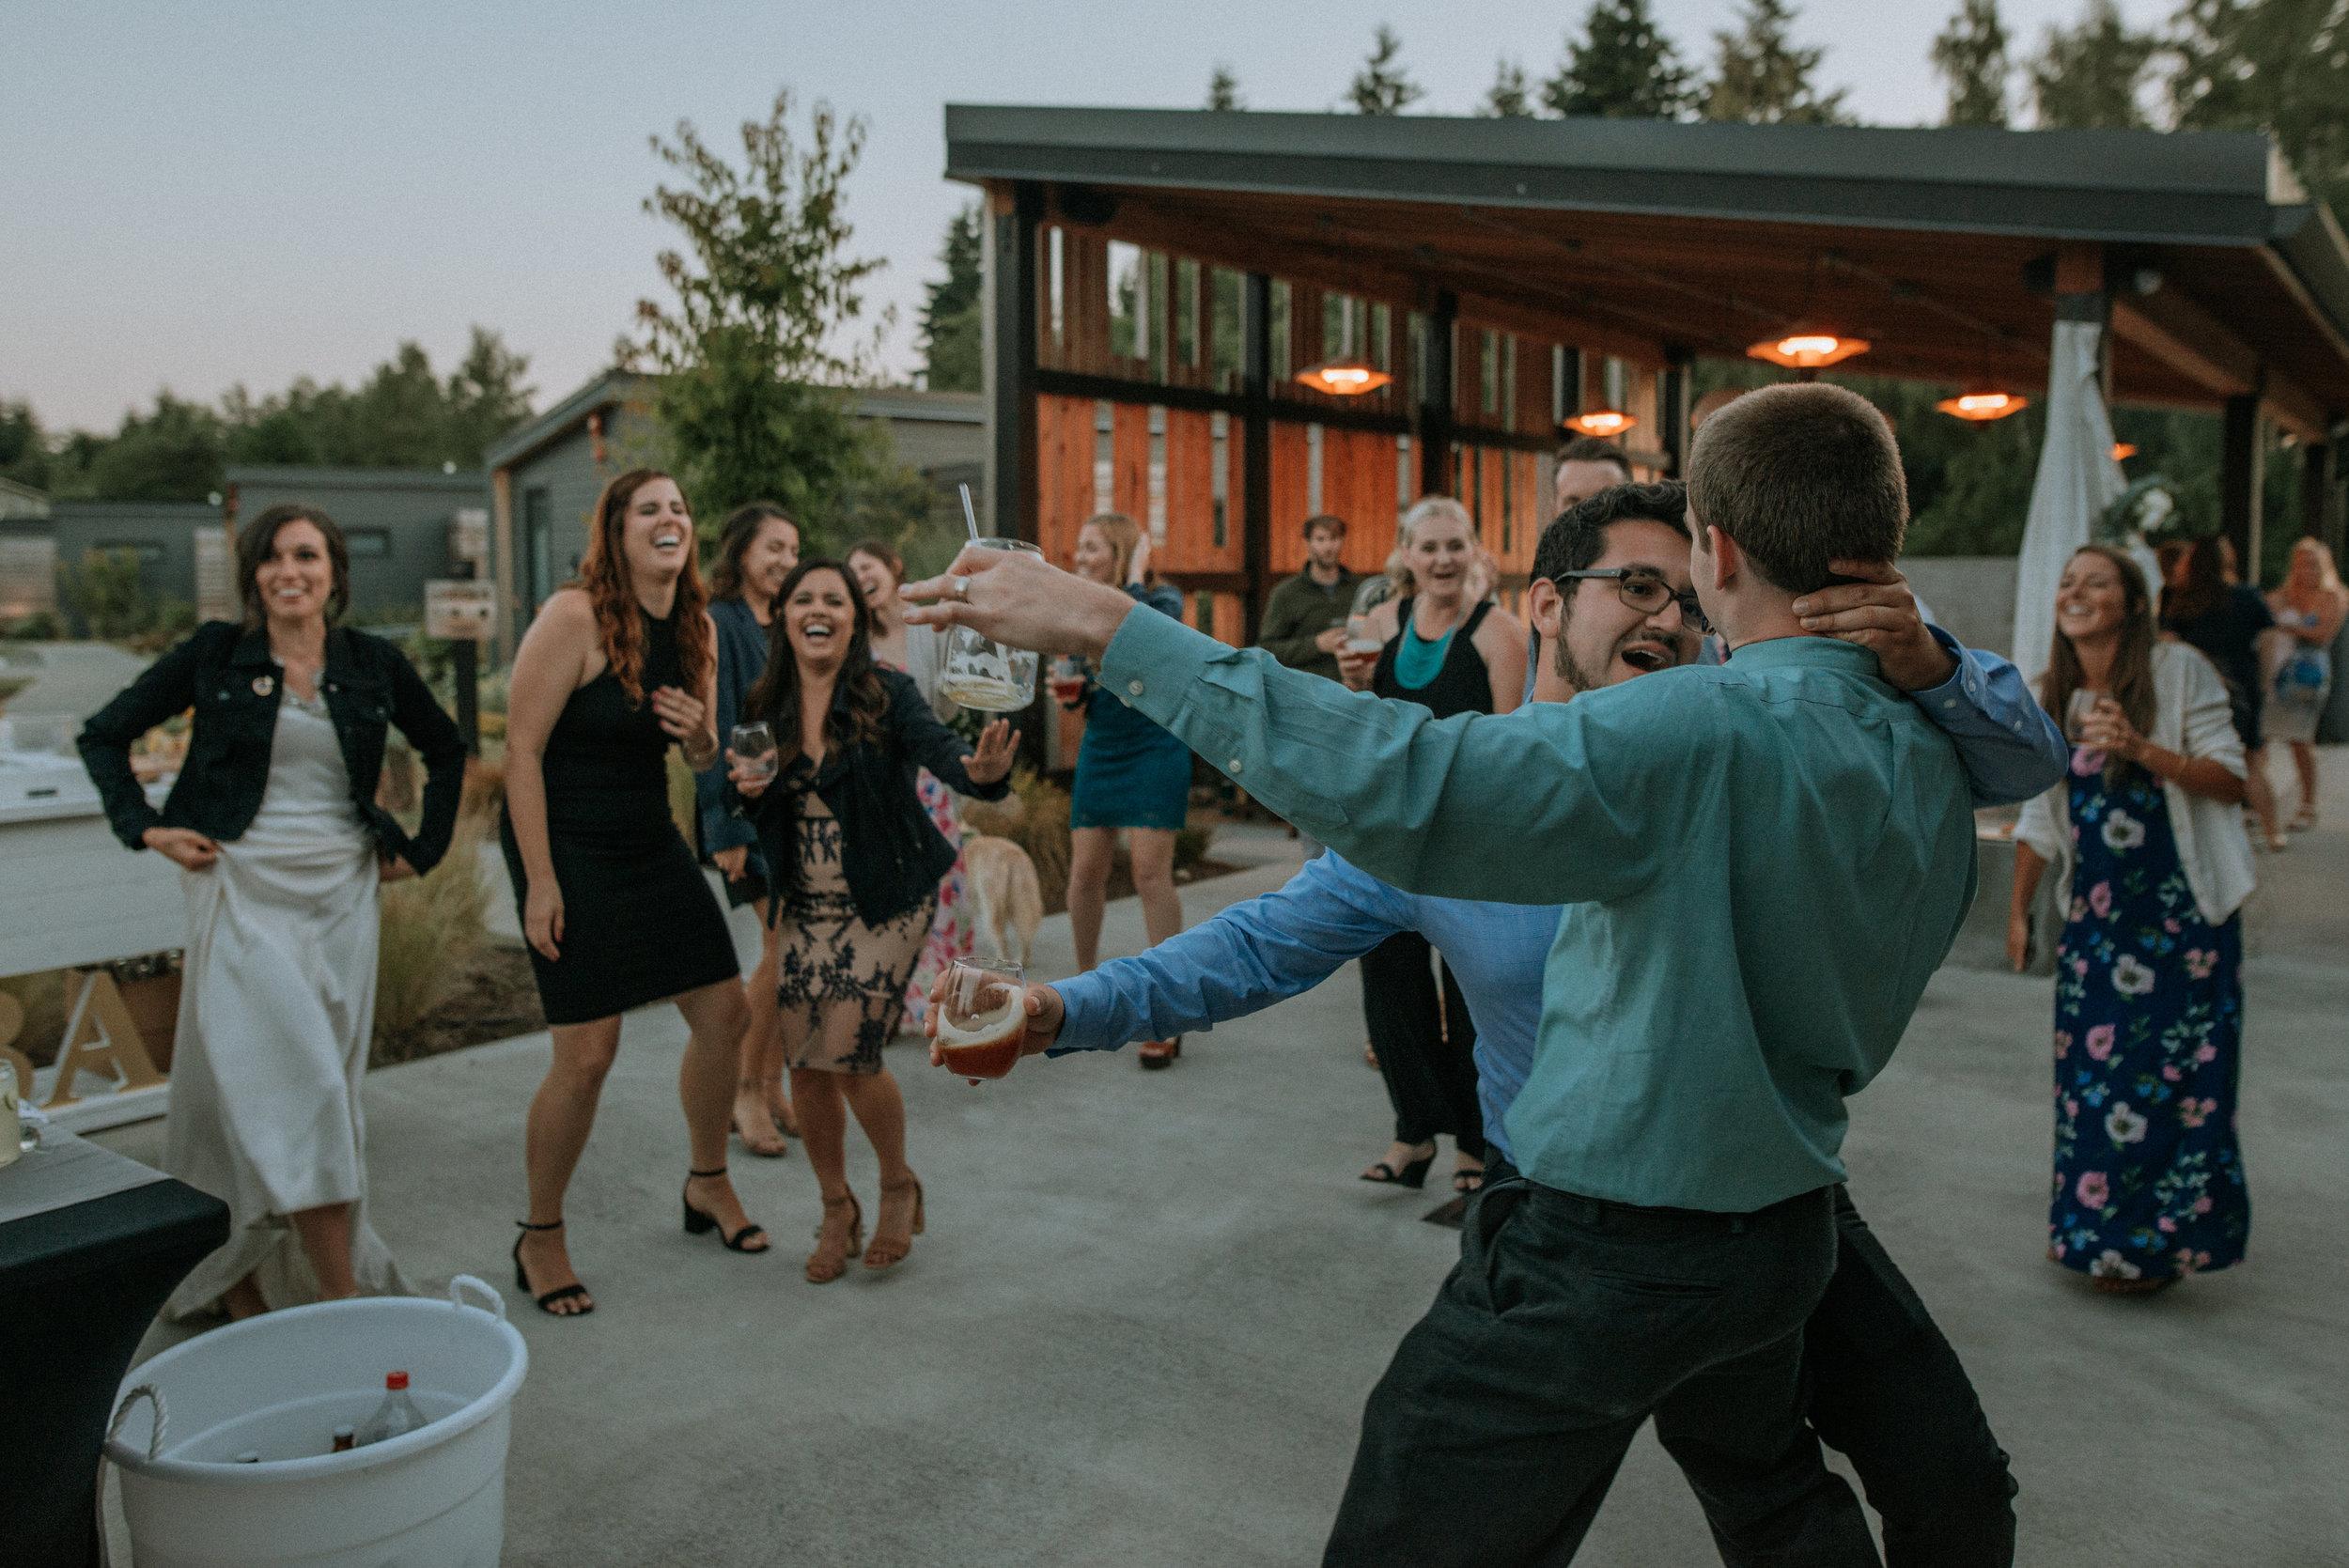 Lodges-at-Vashon-Wedding168.jpg